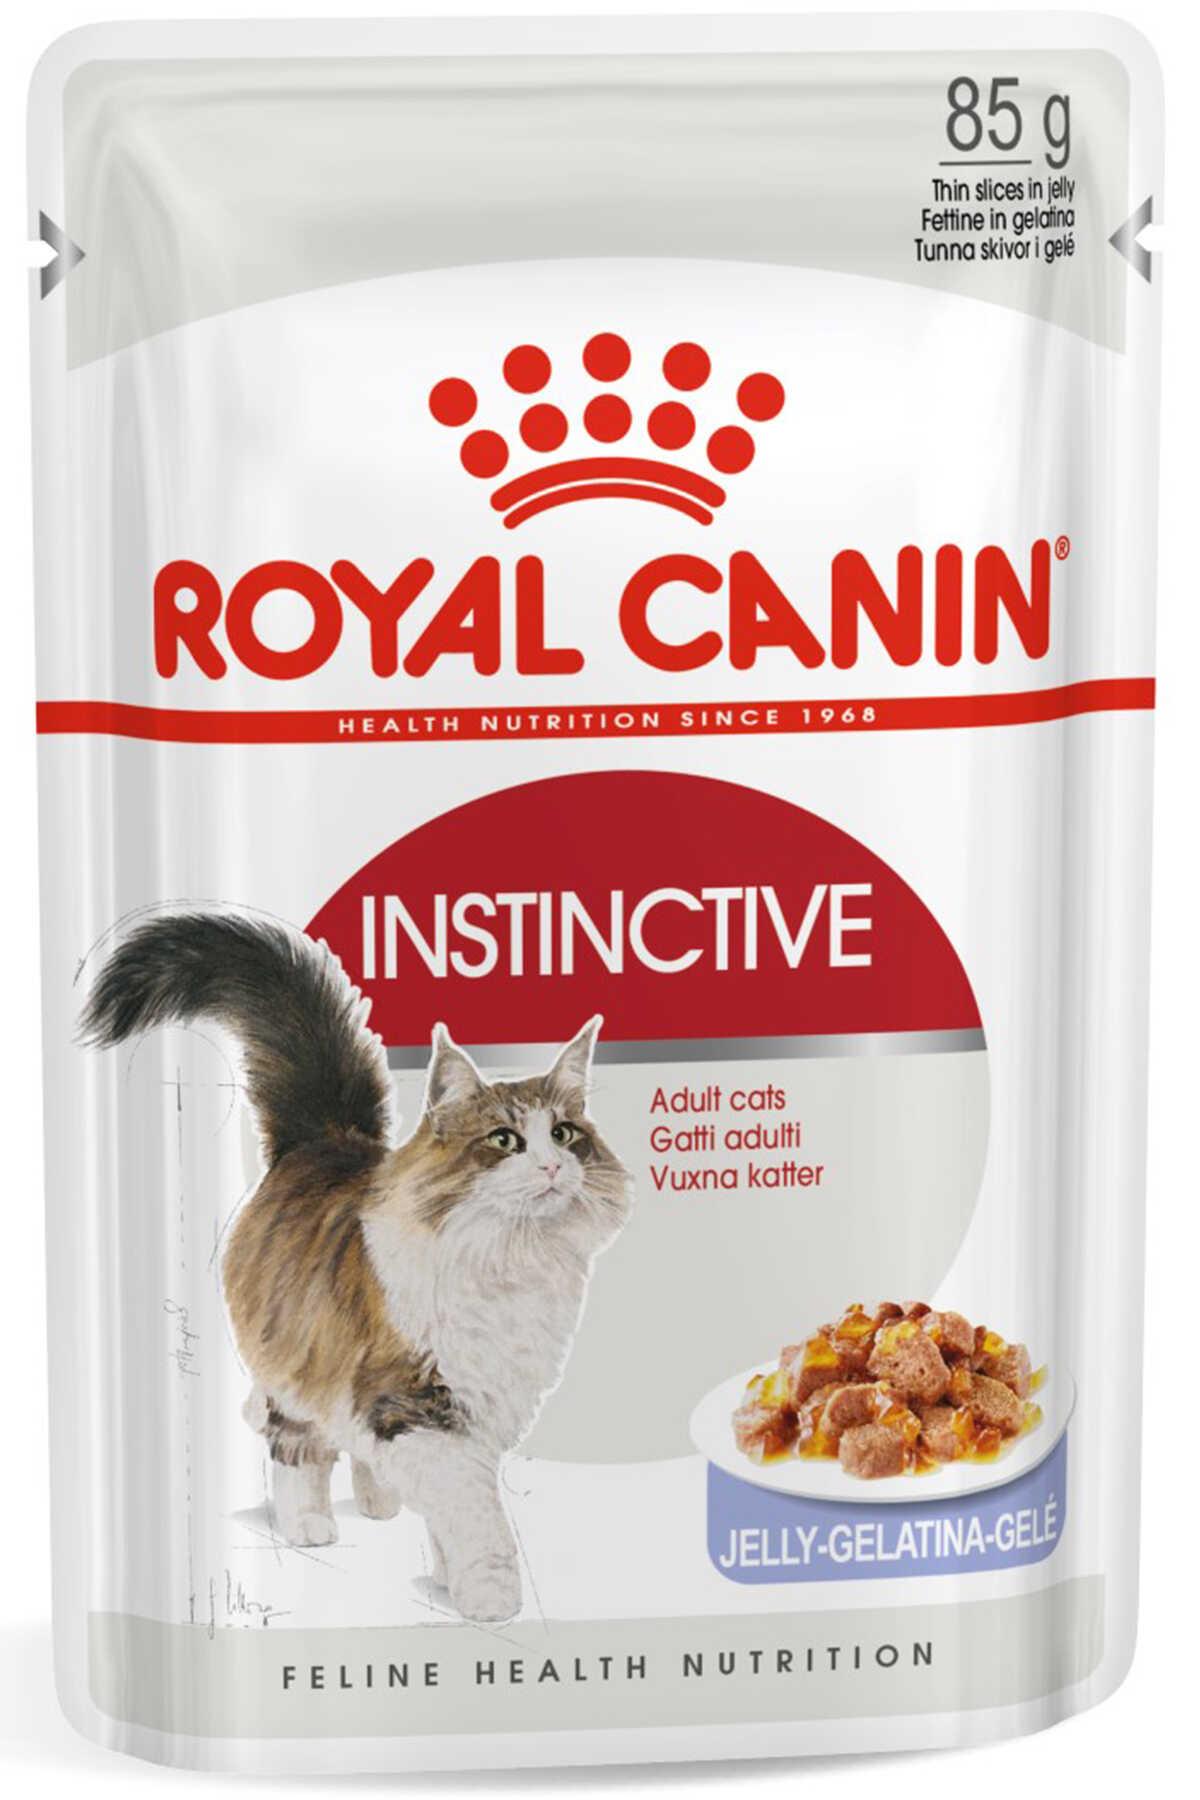 Royal Canin Instinctive Jöleli Kedi Konservesi 85gr